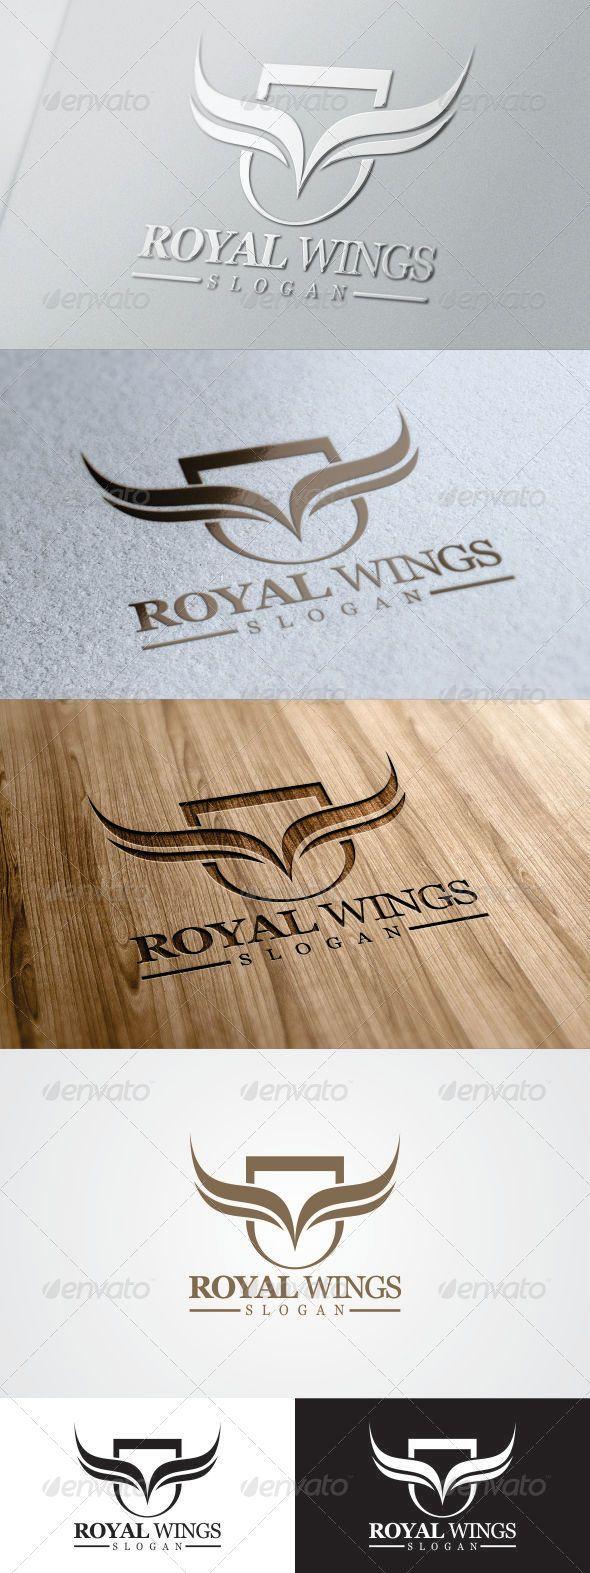 Olympic rings logo rio 2016 olympics logo designed by fred gelli - Royal Wings Logo